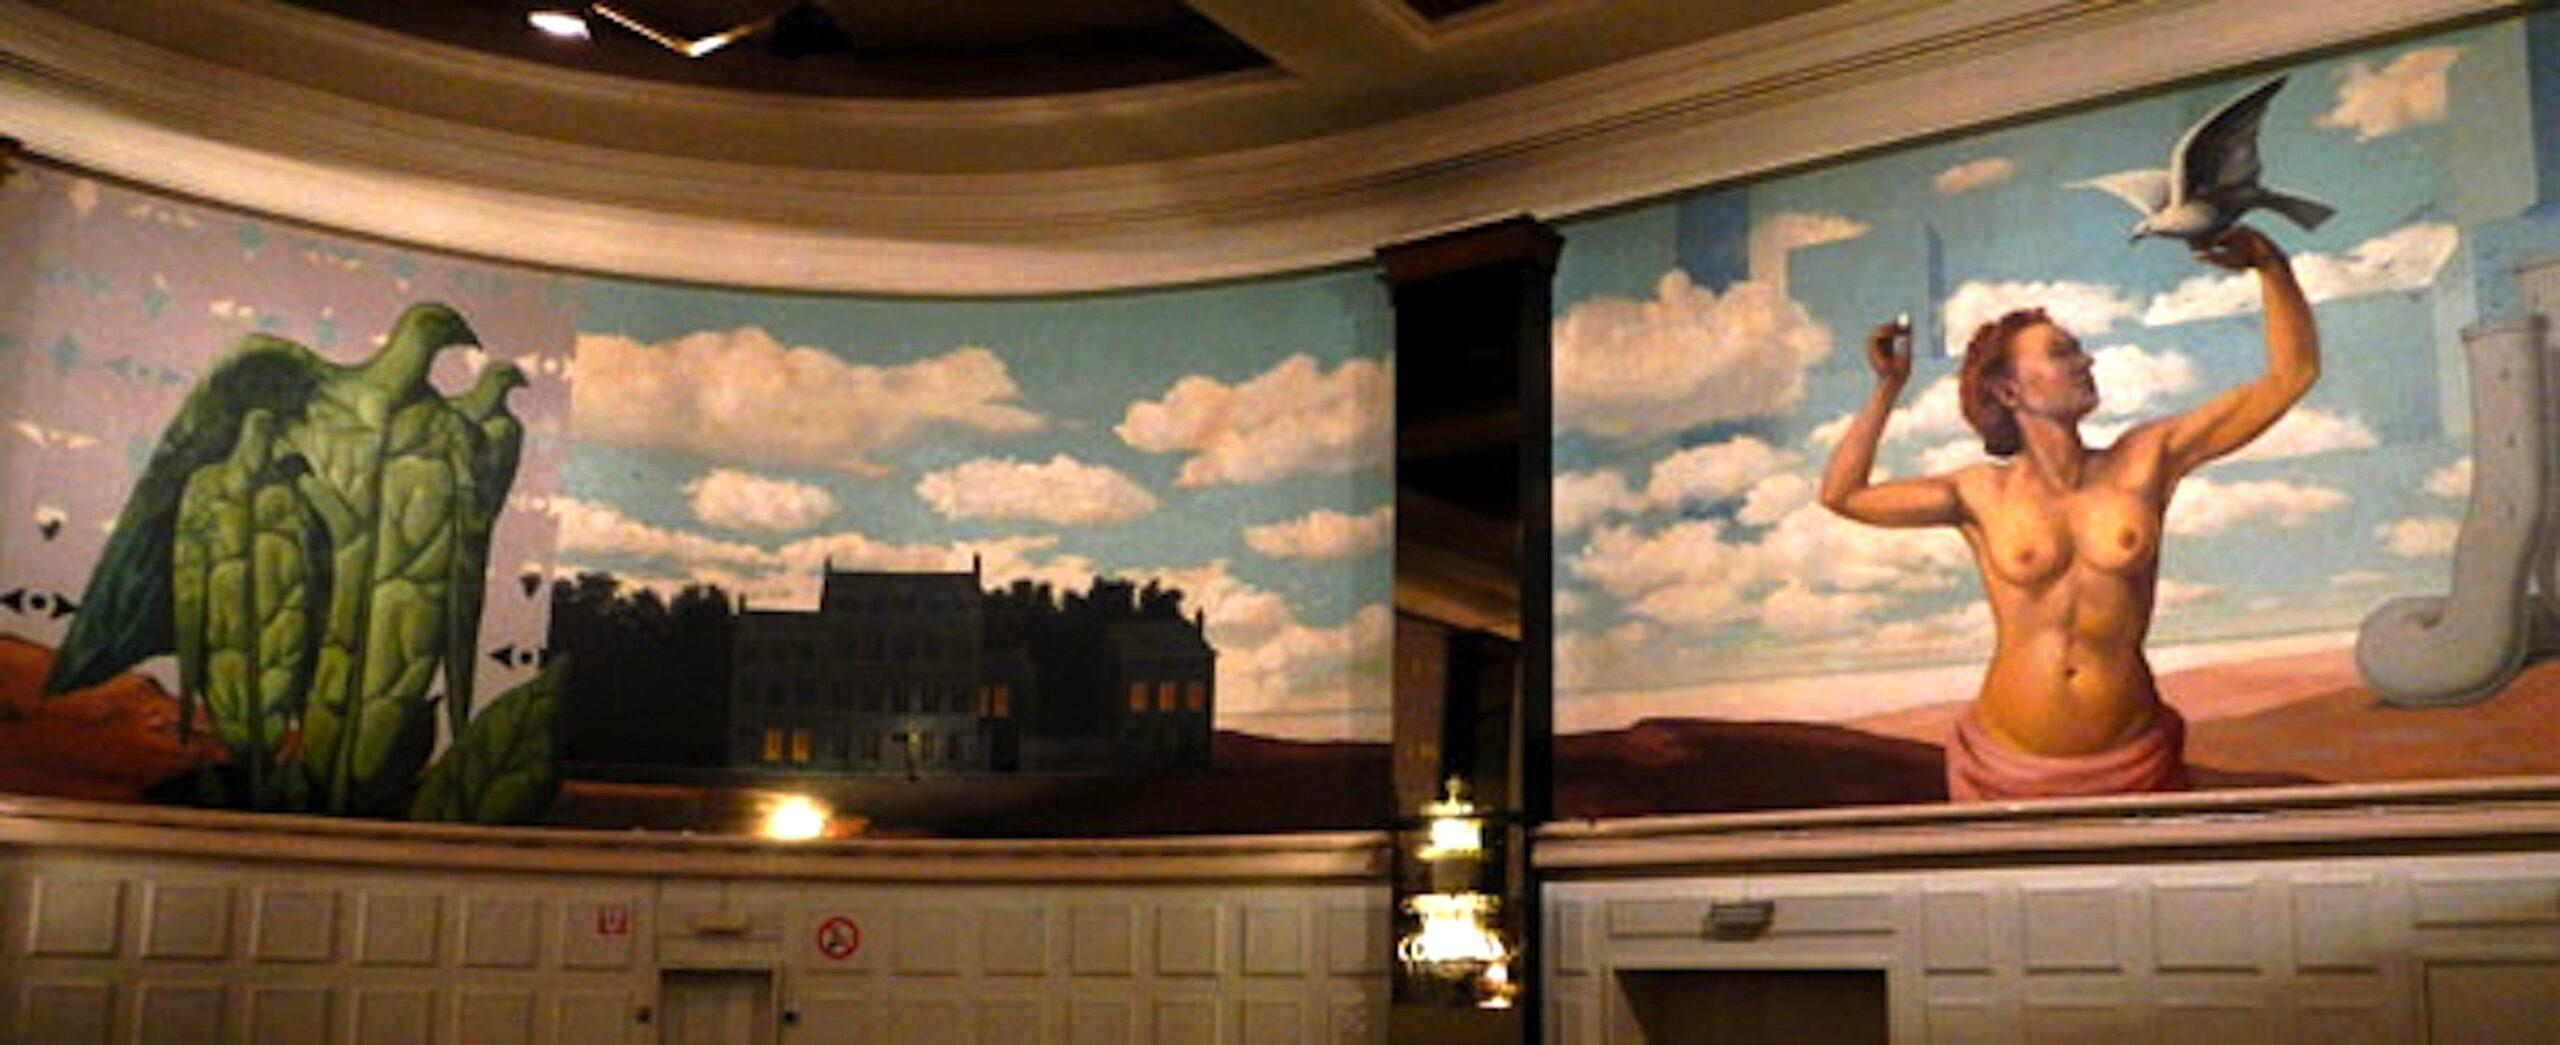 Knokke-Heist-Casino-with-its-mural-by-Magritte-foto-Eliza-Batz